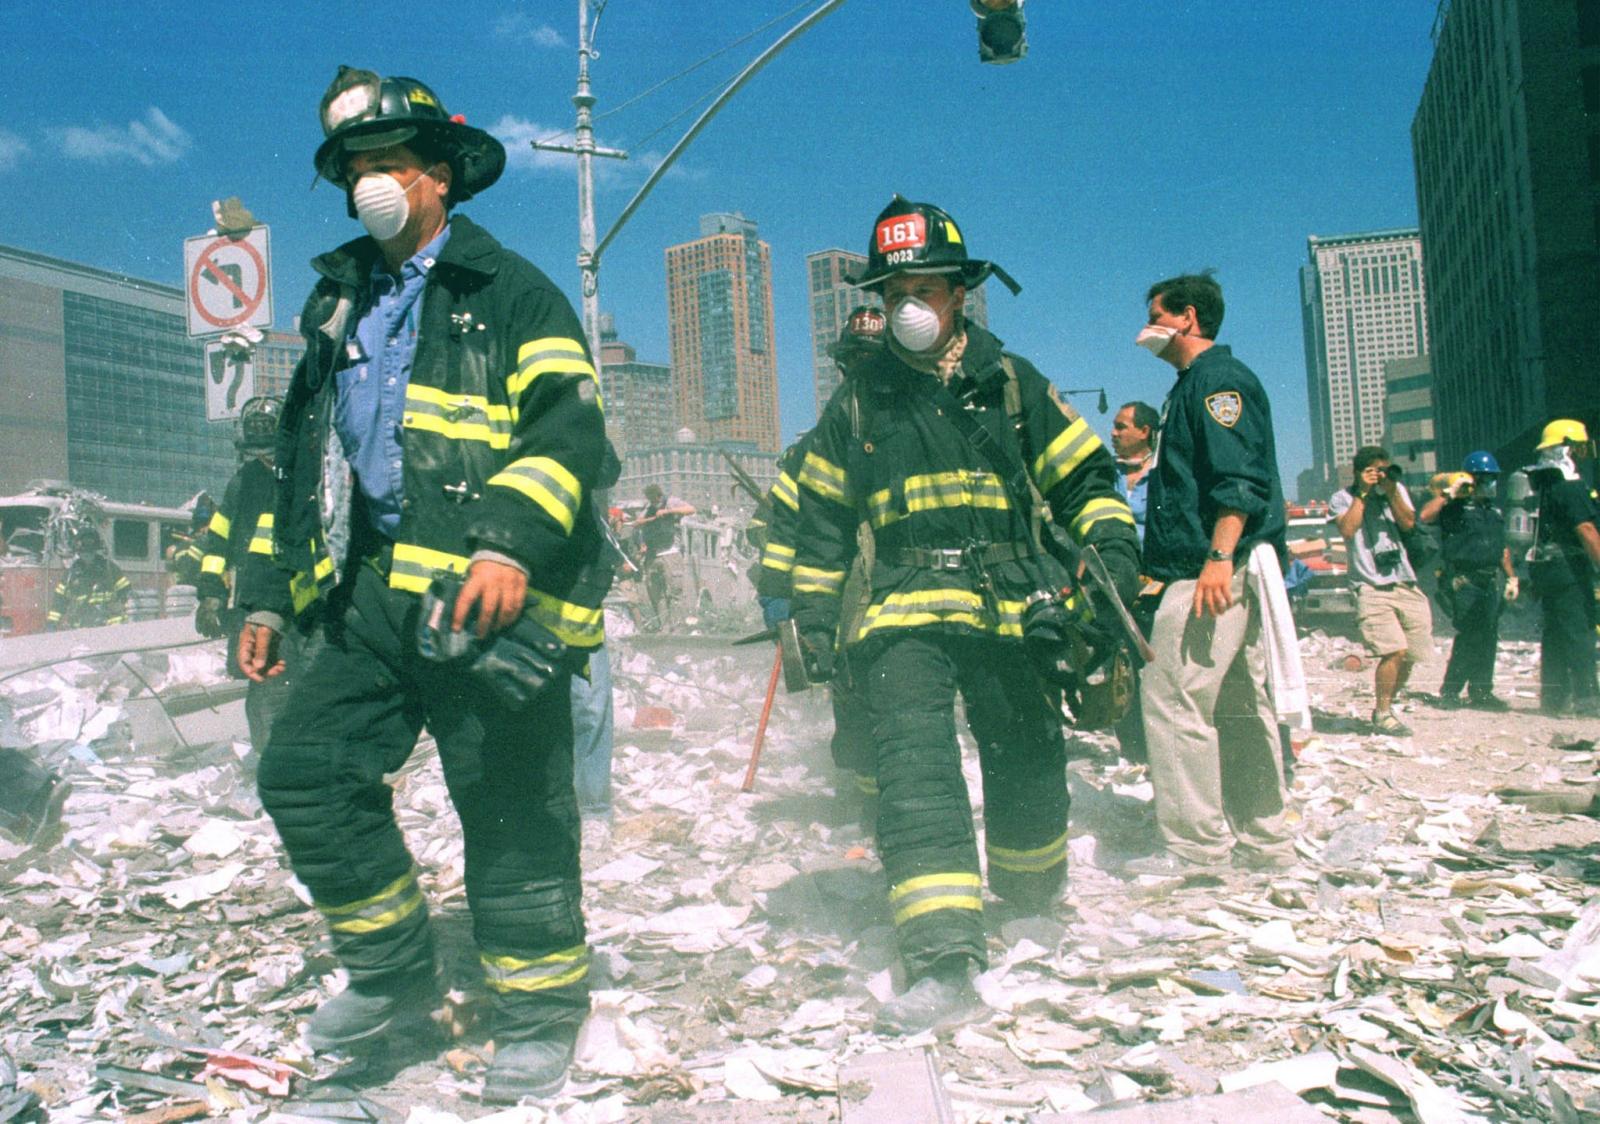 Day of terror 9-11 full colour book